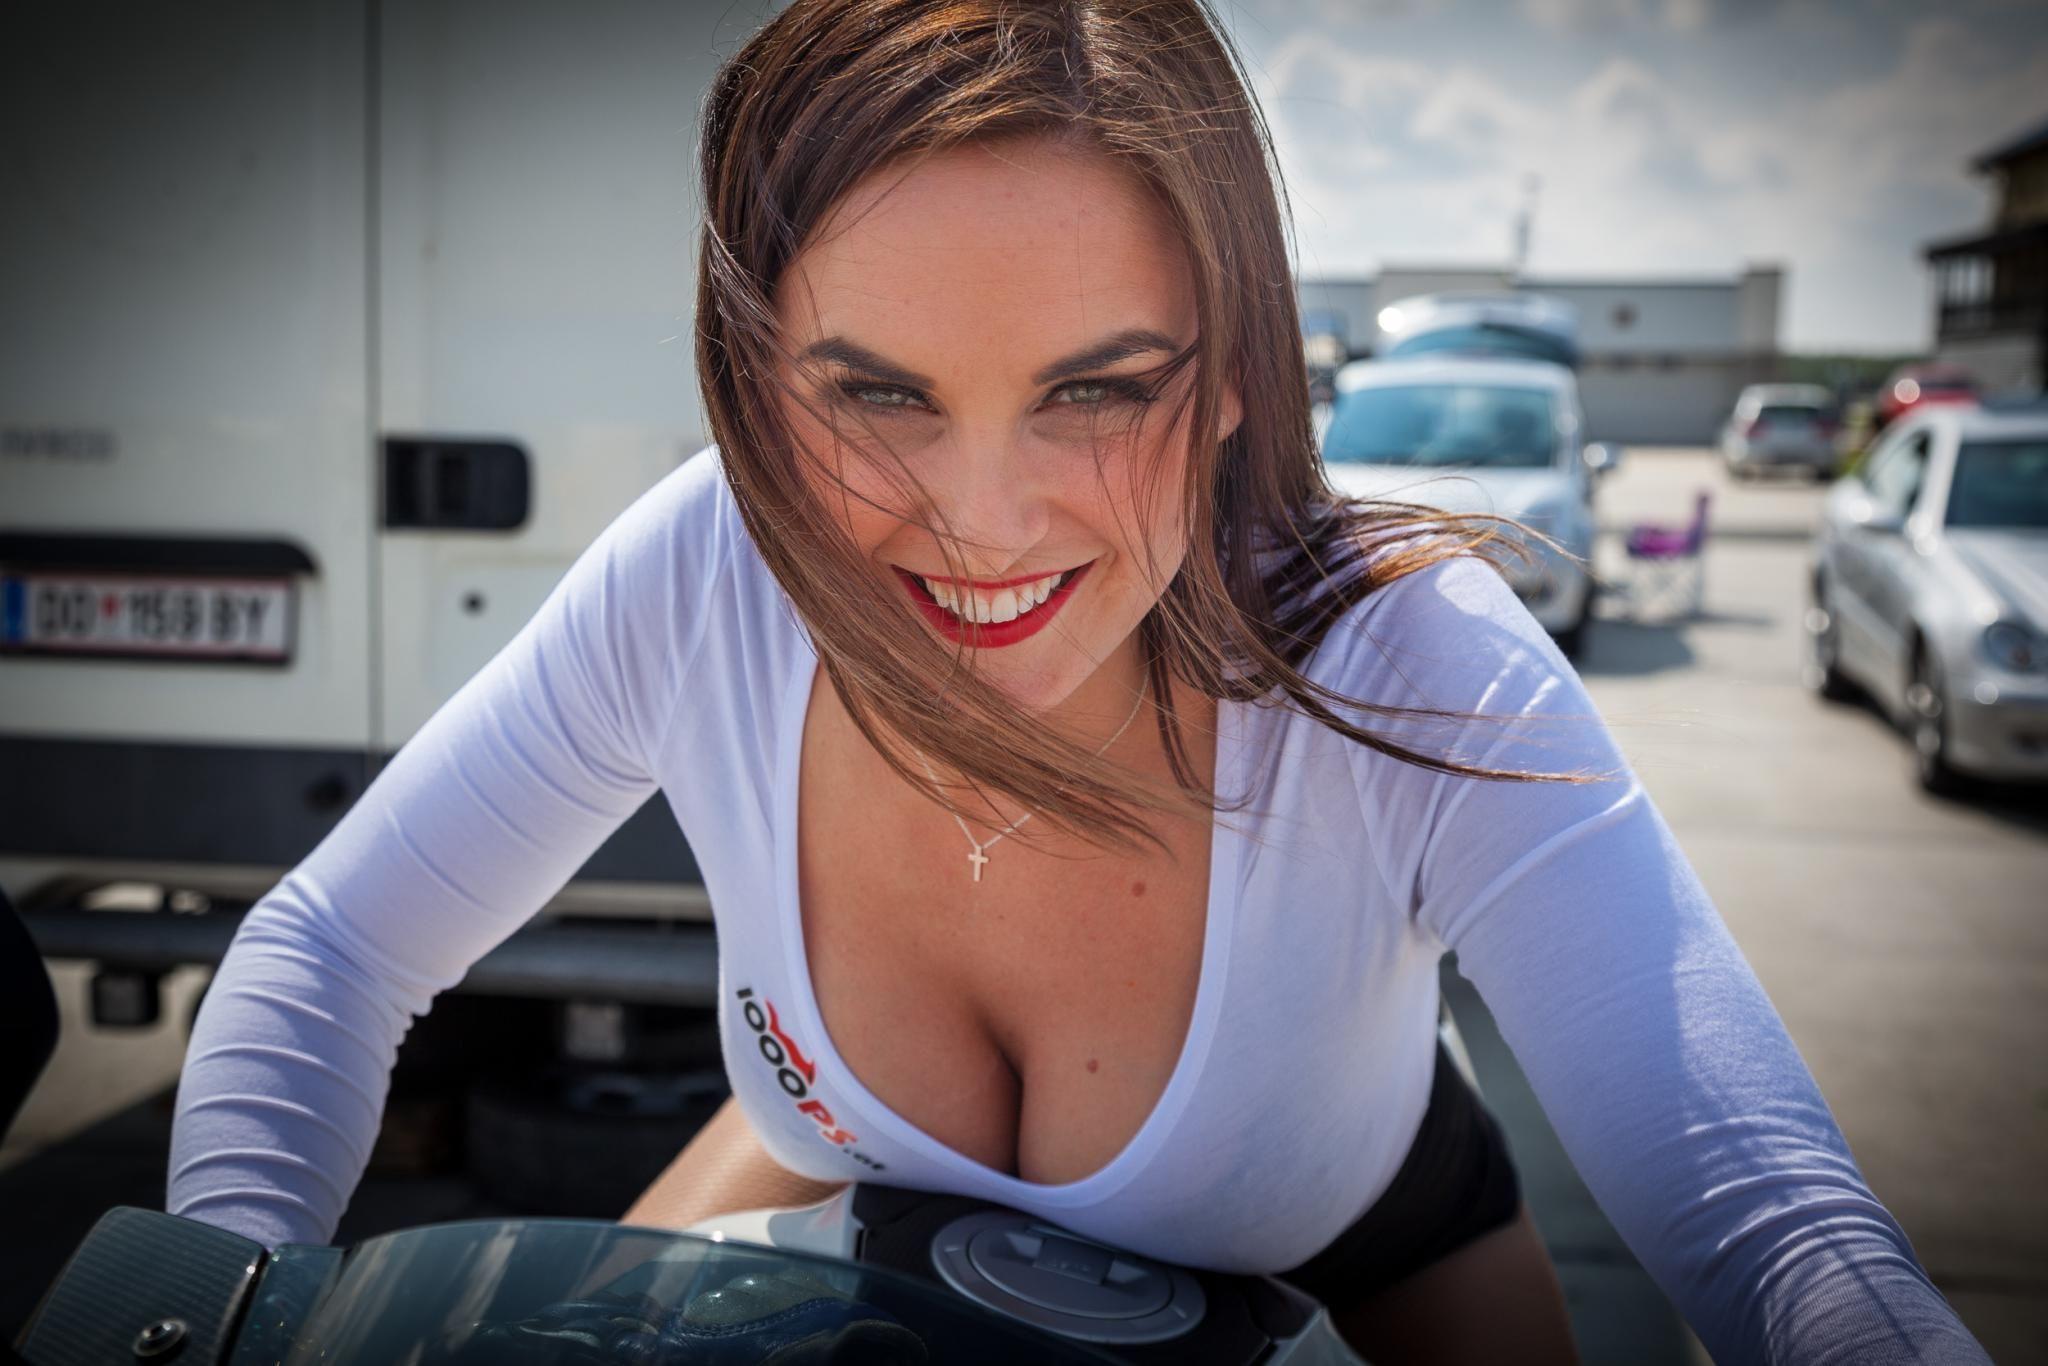 【RQエロ画像】マンスジにモリマンも!魅せ過ぎな海外レースクィーン達www 09